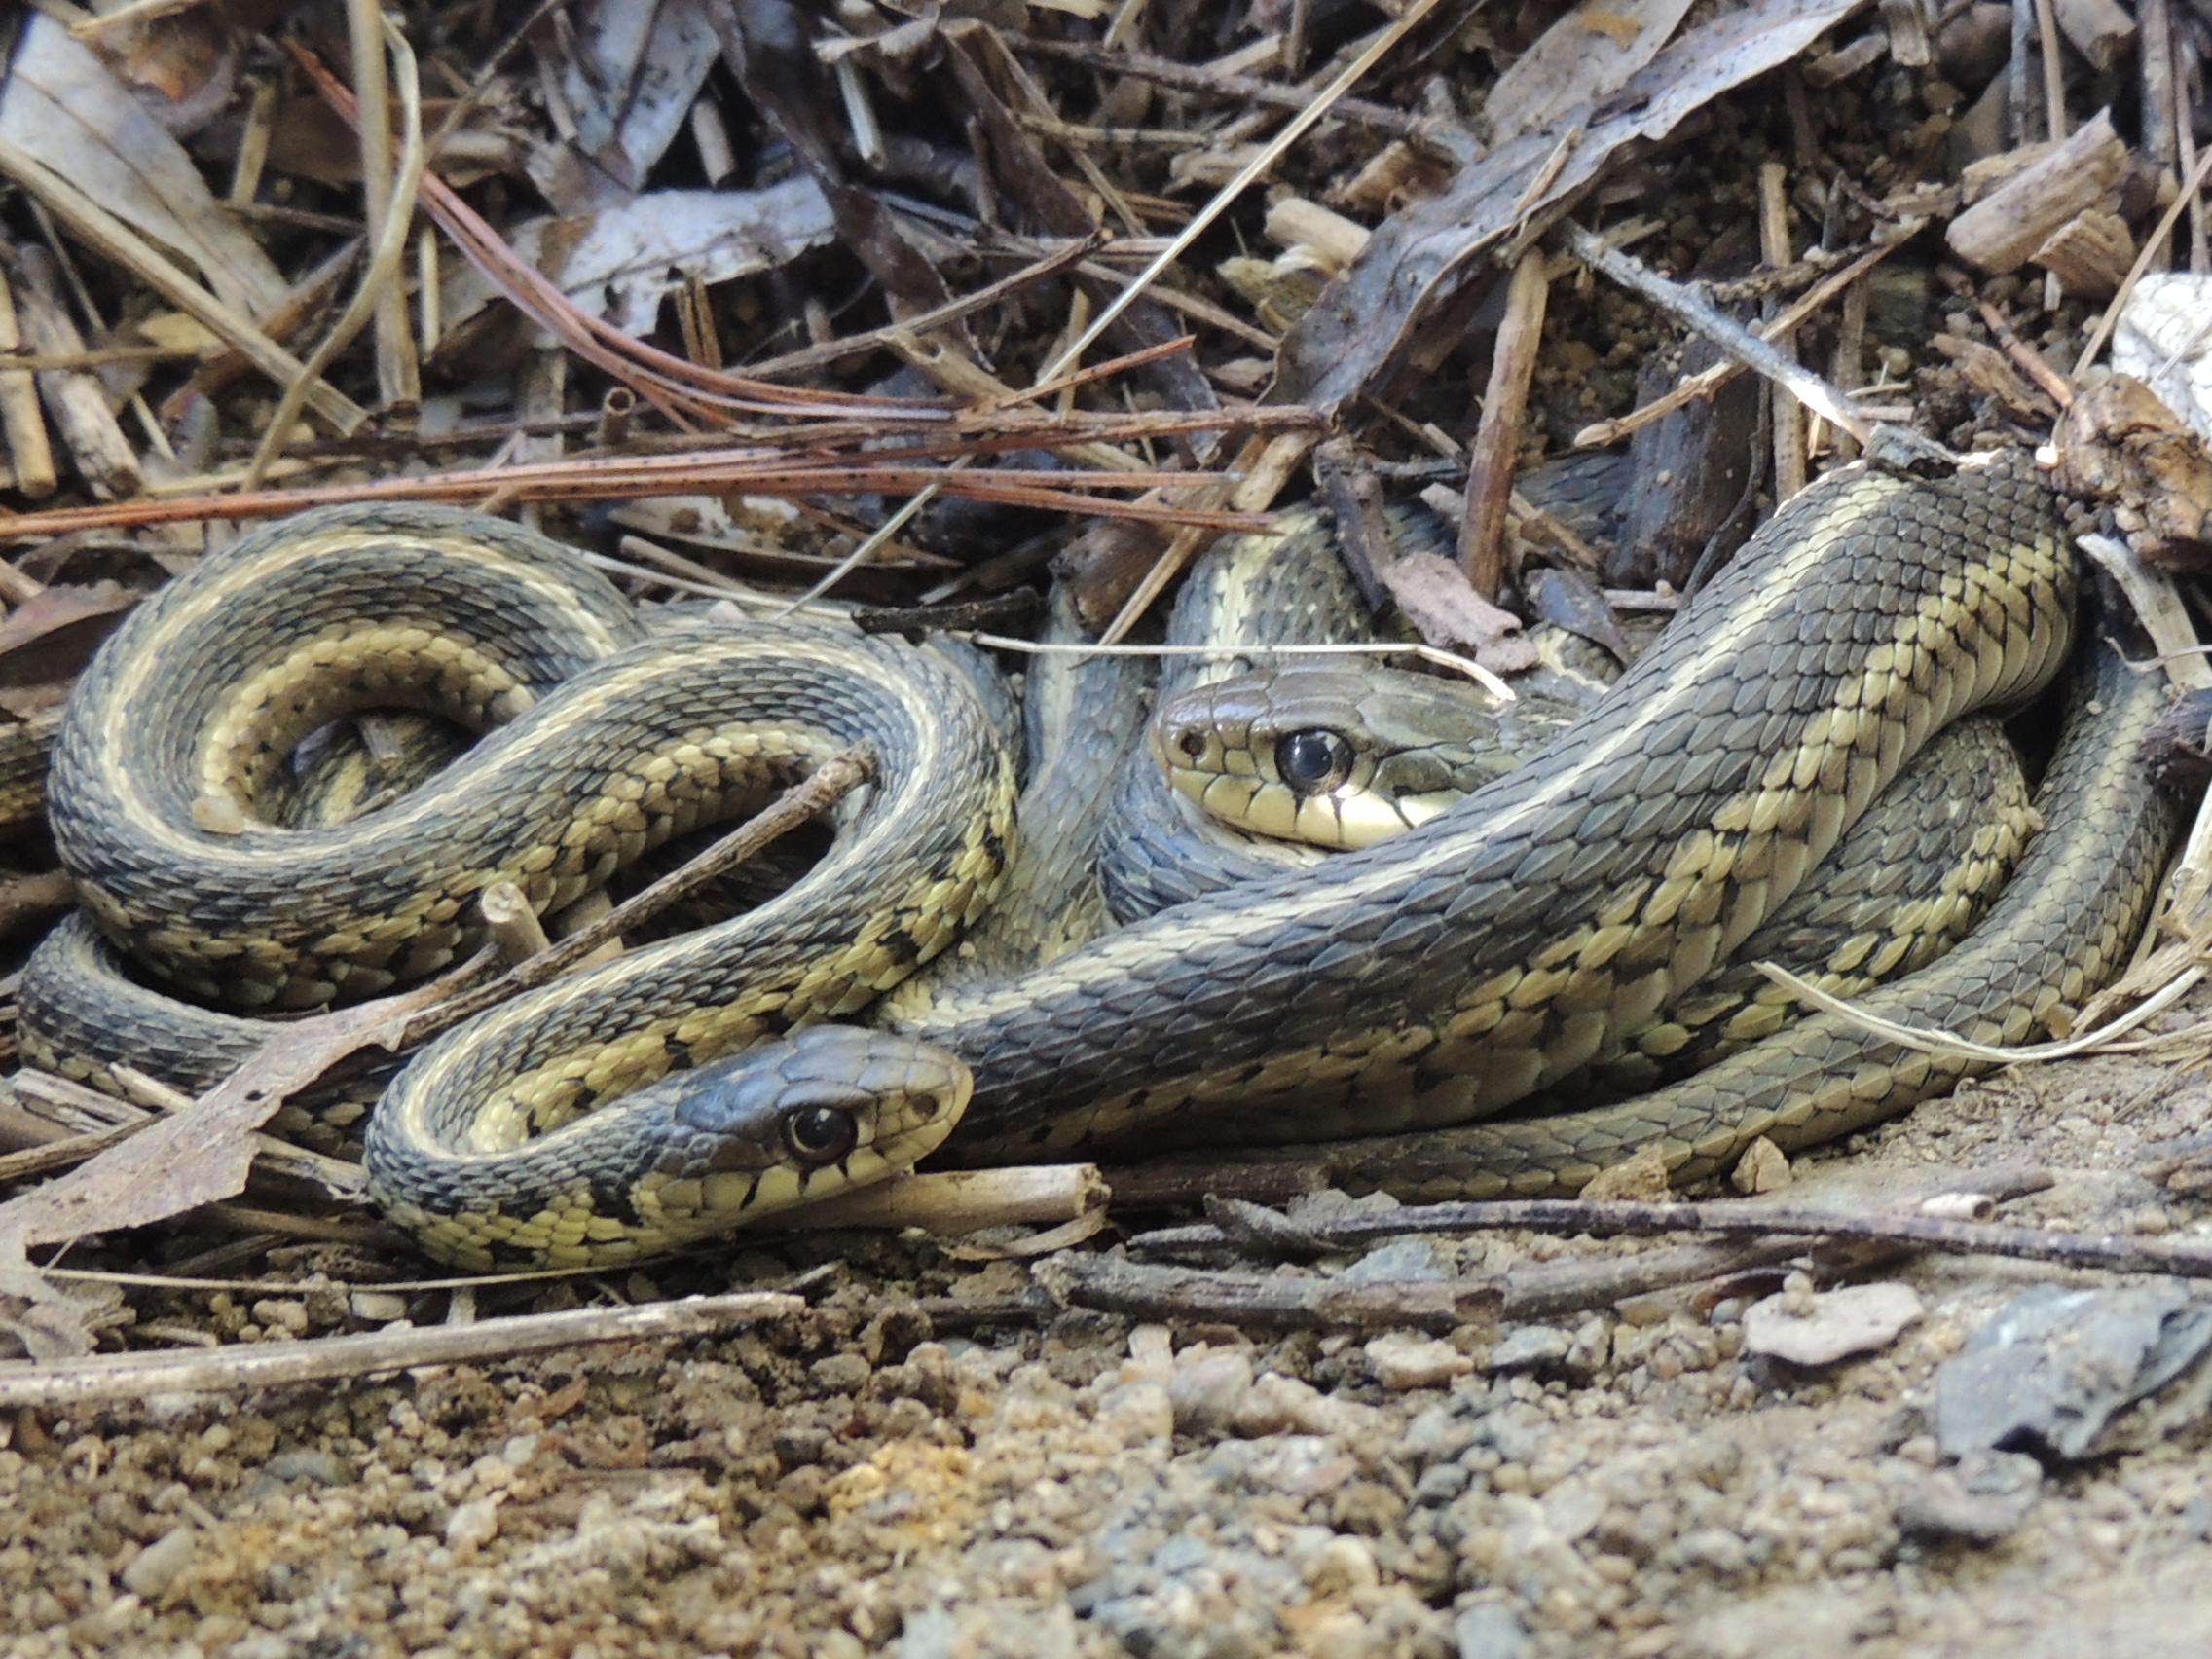 Garter Snake Backgrounds on Wallpapers Vista